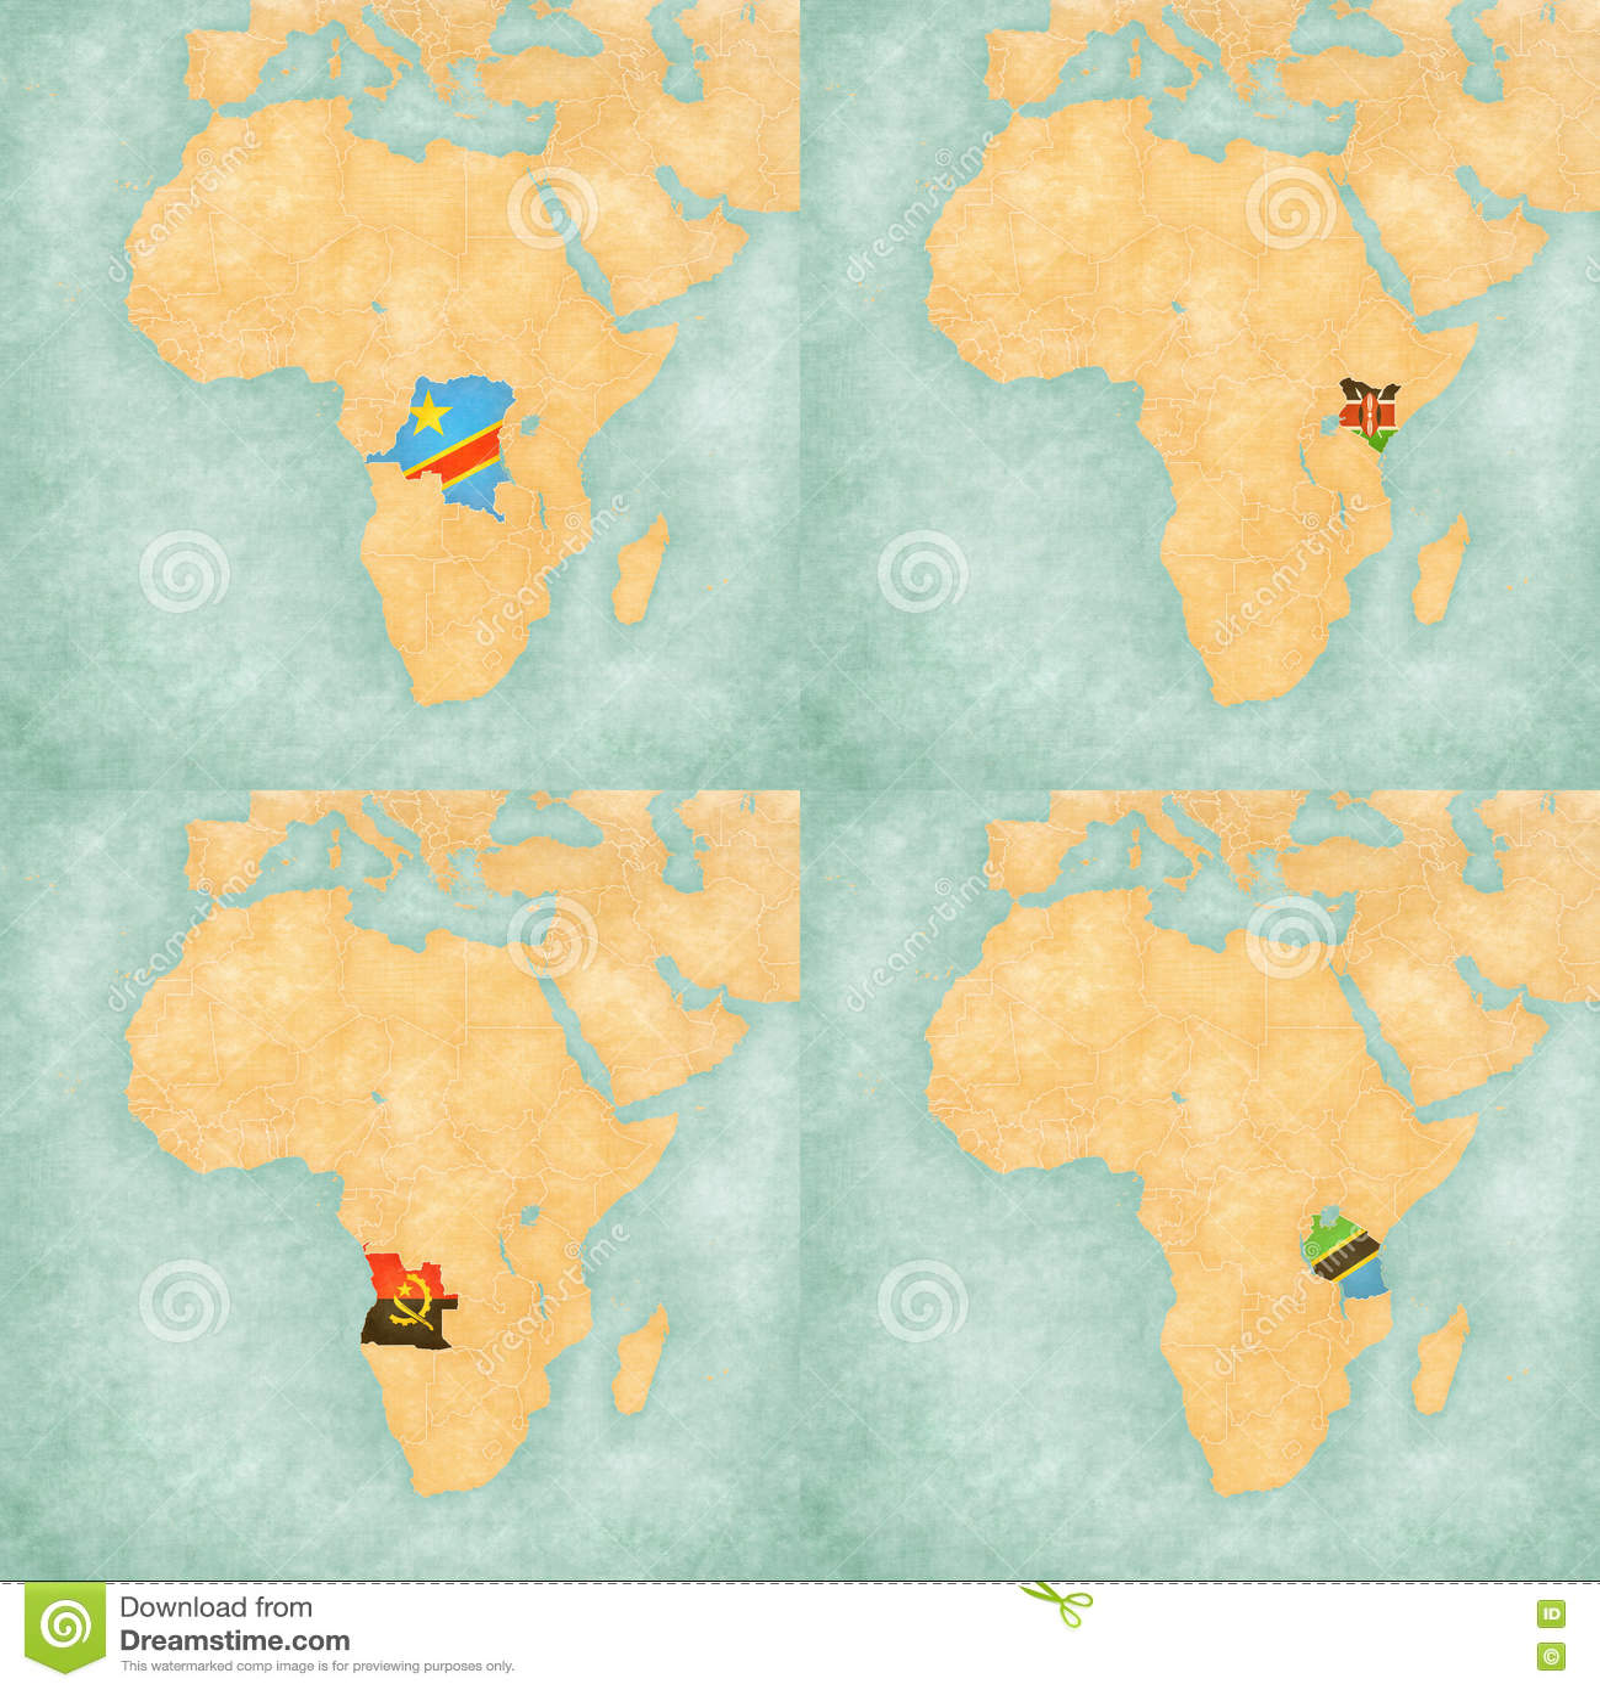 Map Of Africa Tanzania.Map Of Africa Dr Congo Kenya Angola And Tanzania Stock